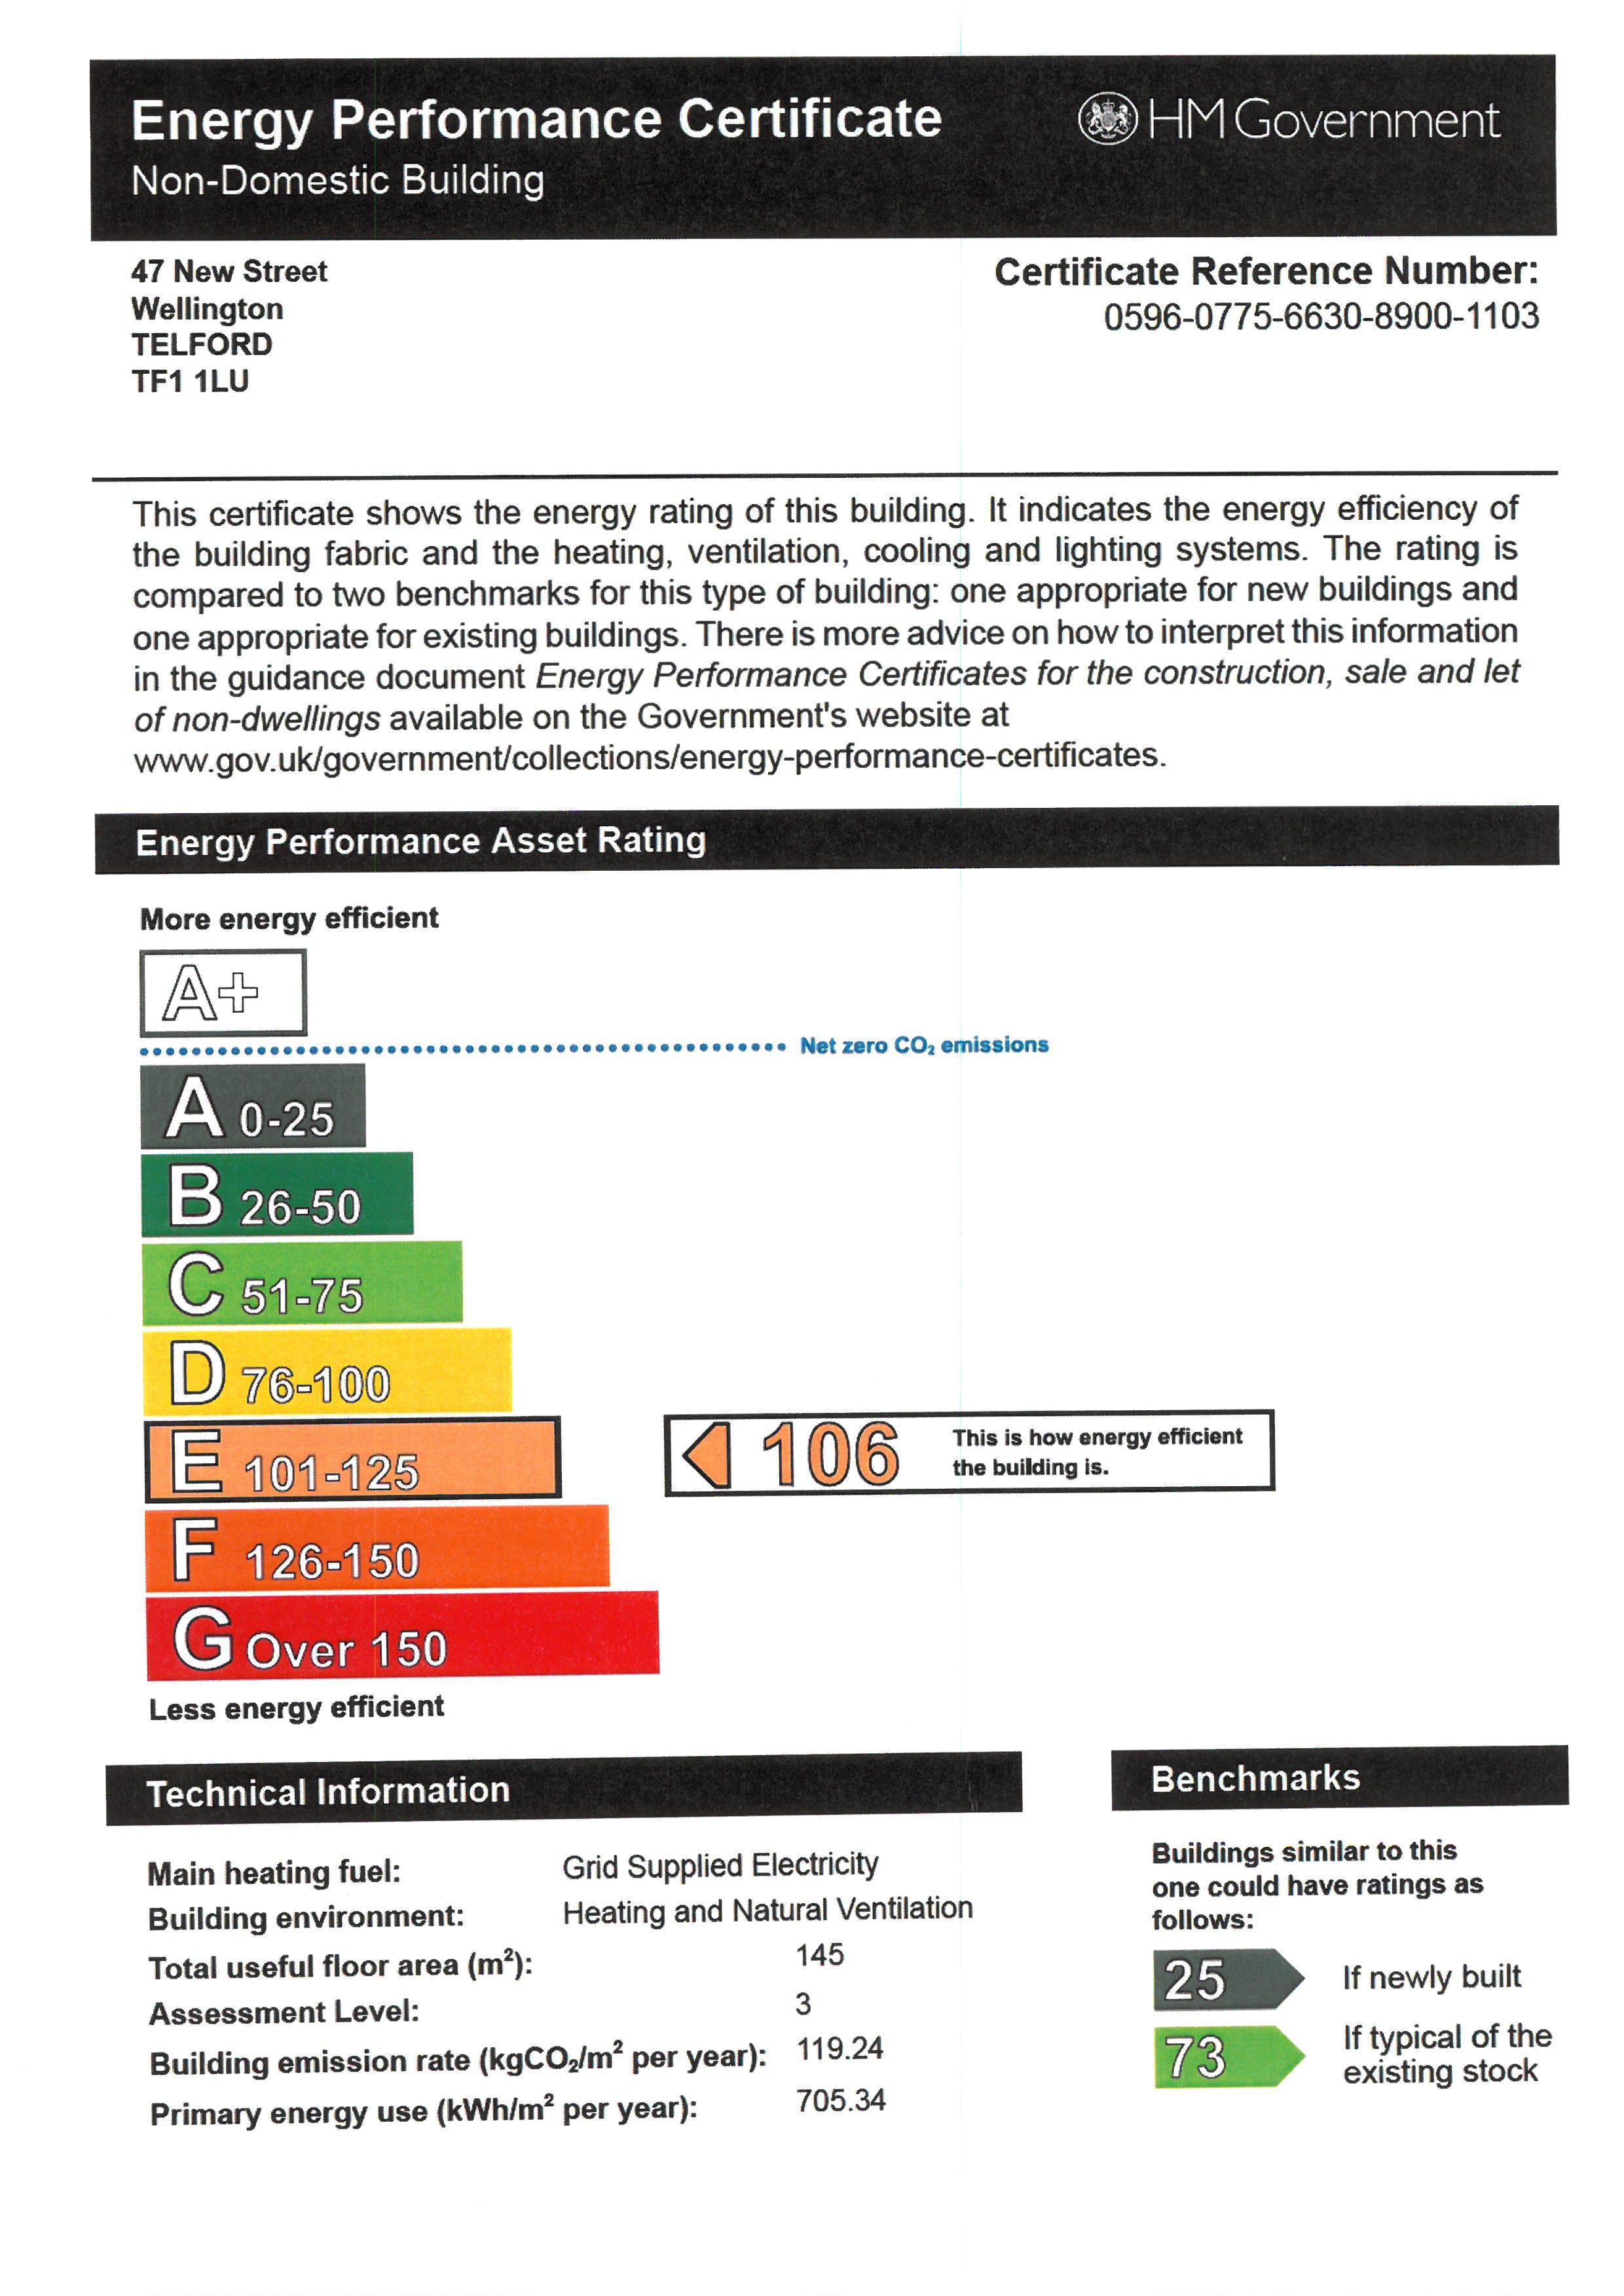 EPC for 47 New Street, Wellington, Telford, Shropshire, tf1 1lu